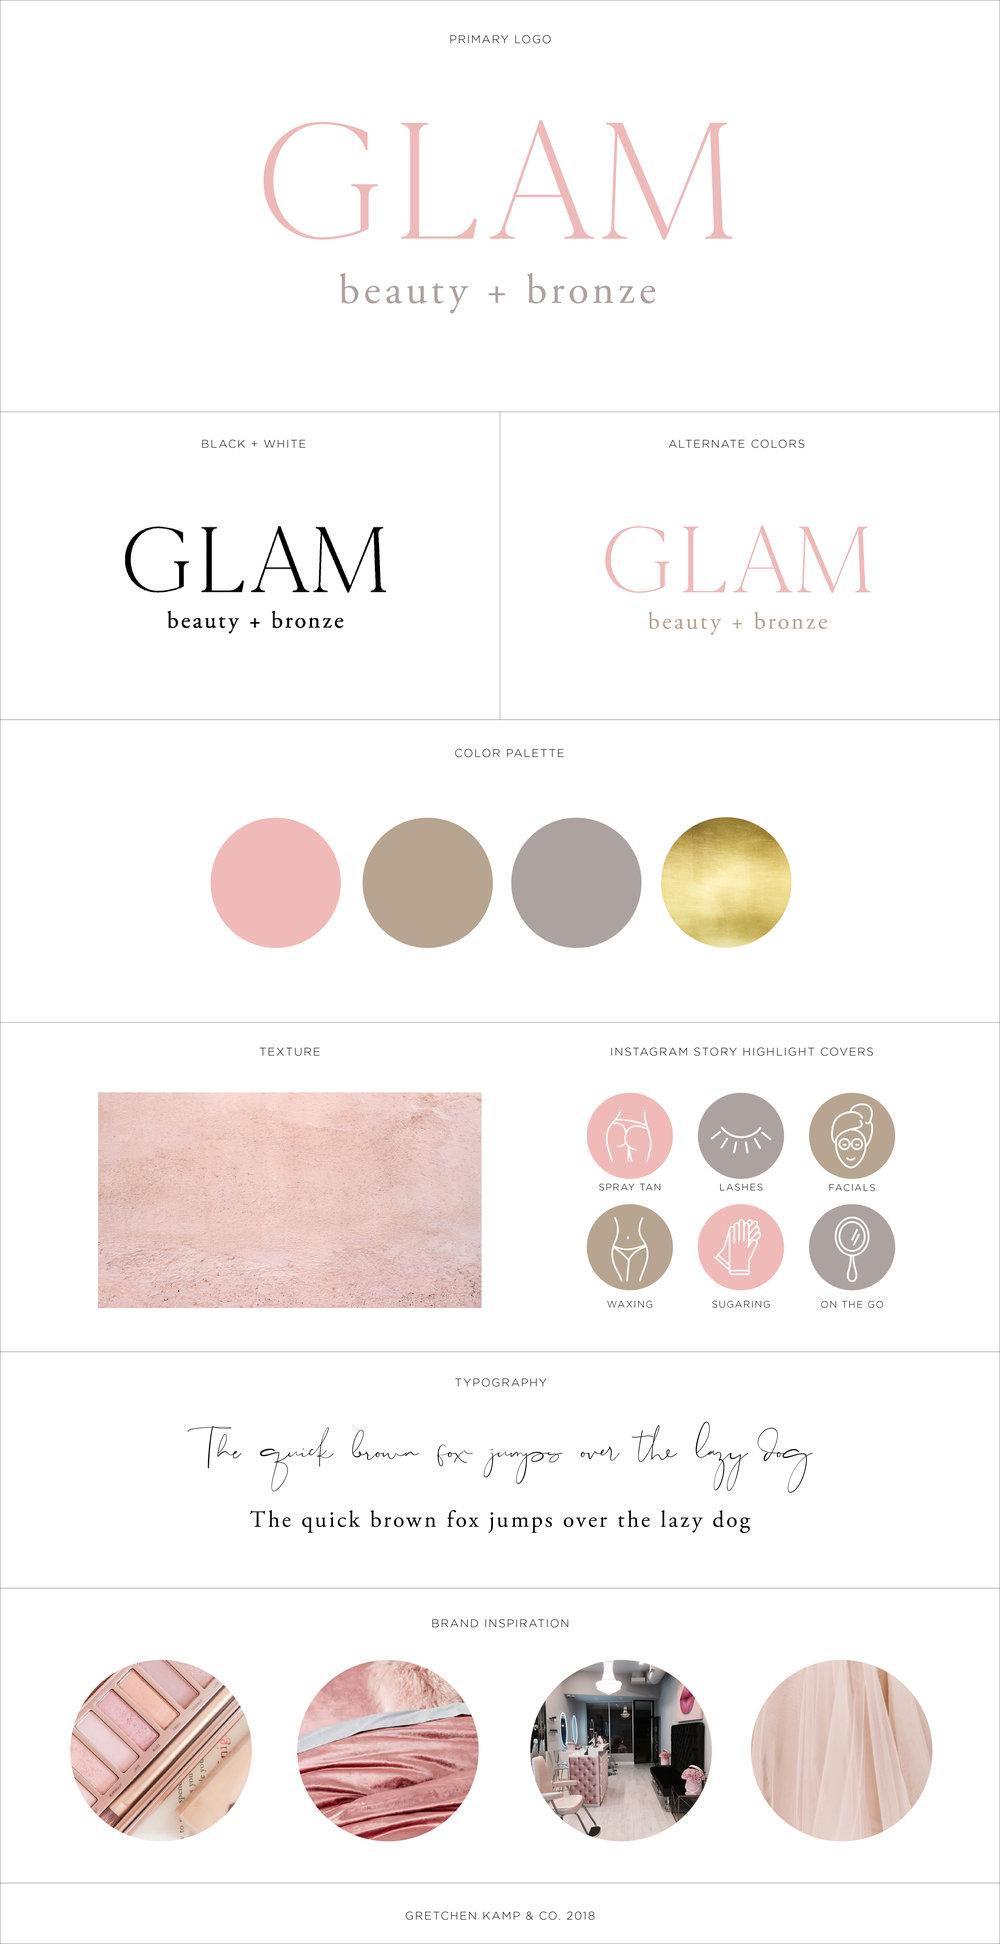 GlamB+B_brandboard_v02.jpg